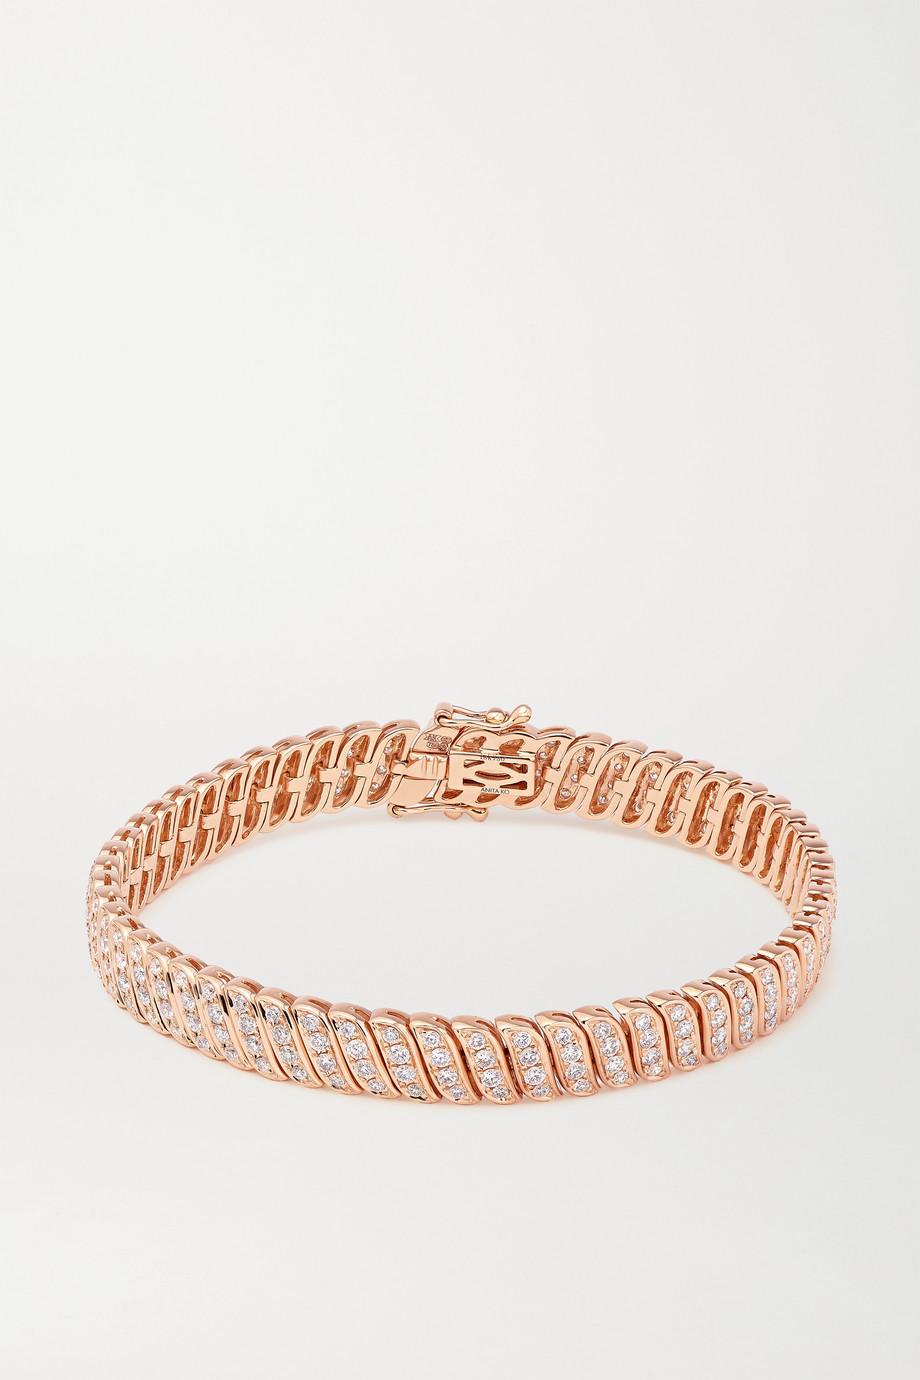 Anita Ko Bracelet en or rose 18 carats (750/1000) et diamants Zoe